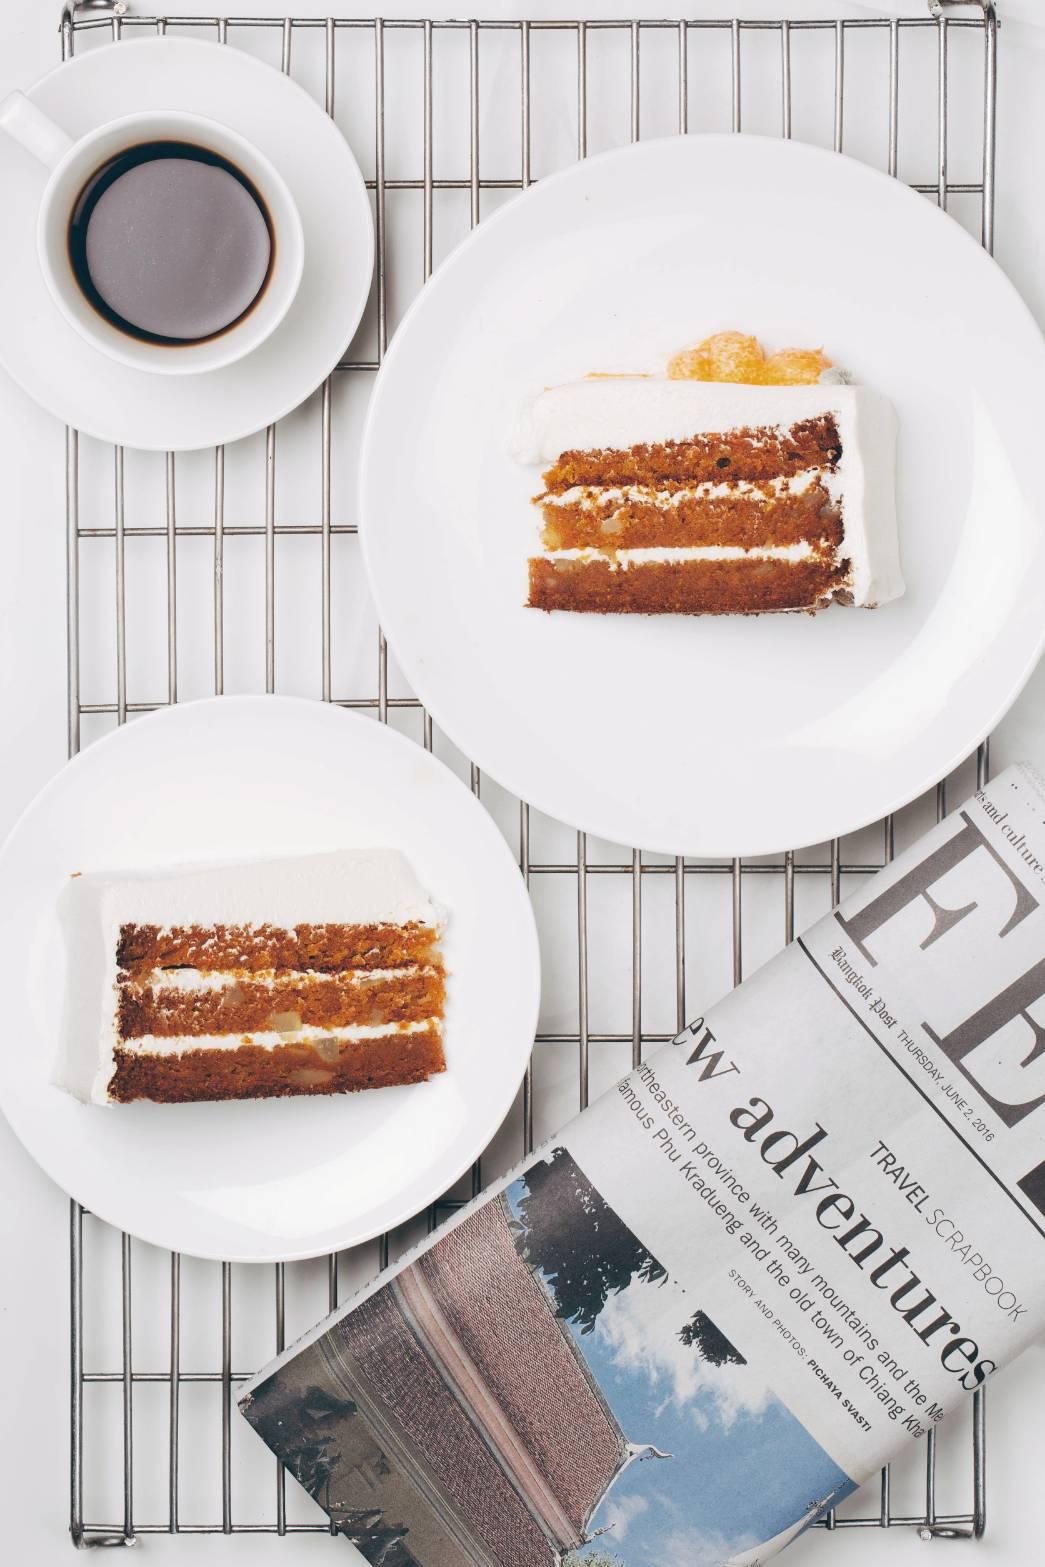 CARROT CAKE - Less flour, more carrot